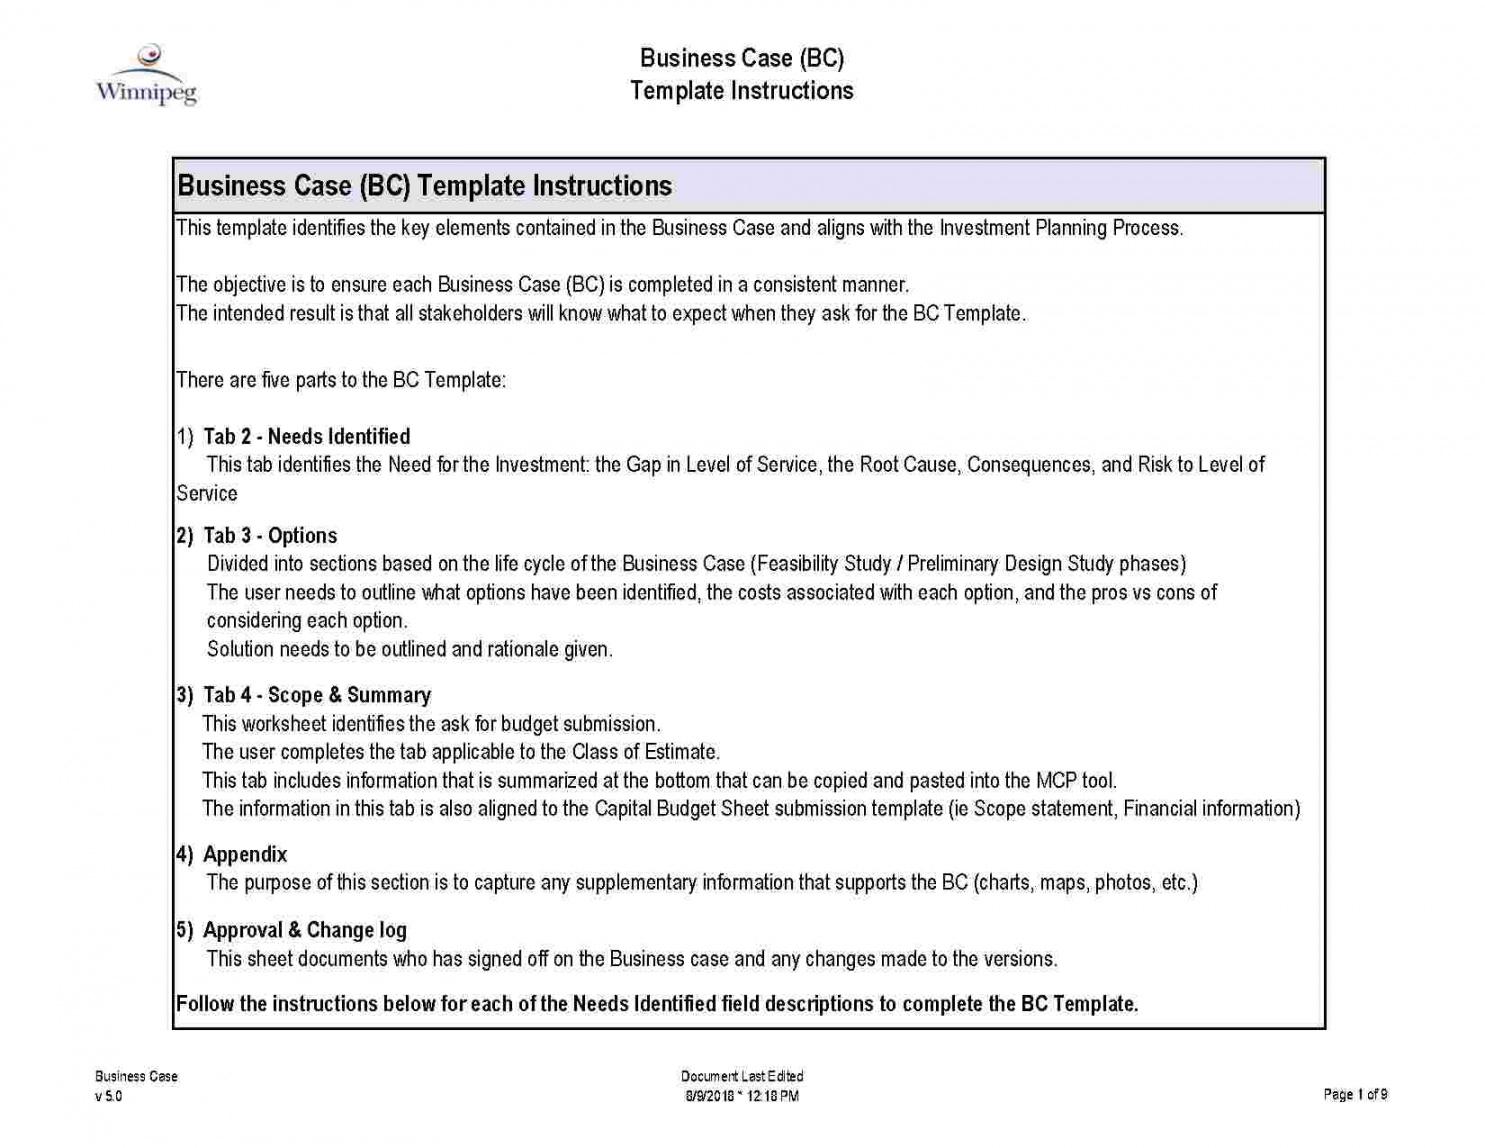 download customer needs analysis style 276 template for free at customer needs analysis template pdf